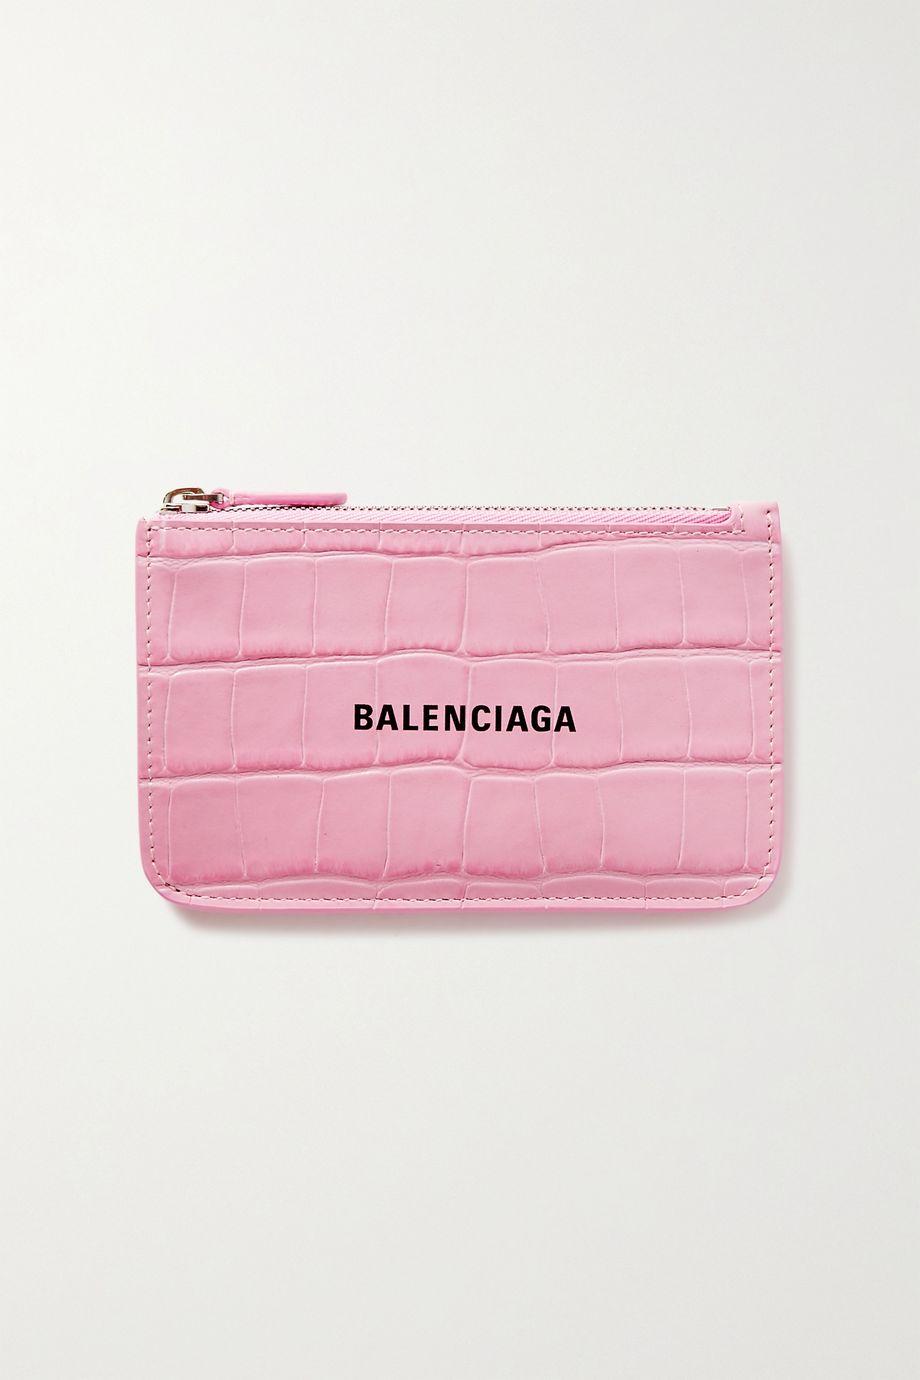 Balenciaga Portefeuille en cuir effet croco imprimé Cash